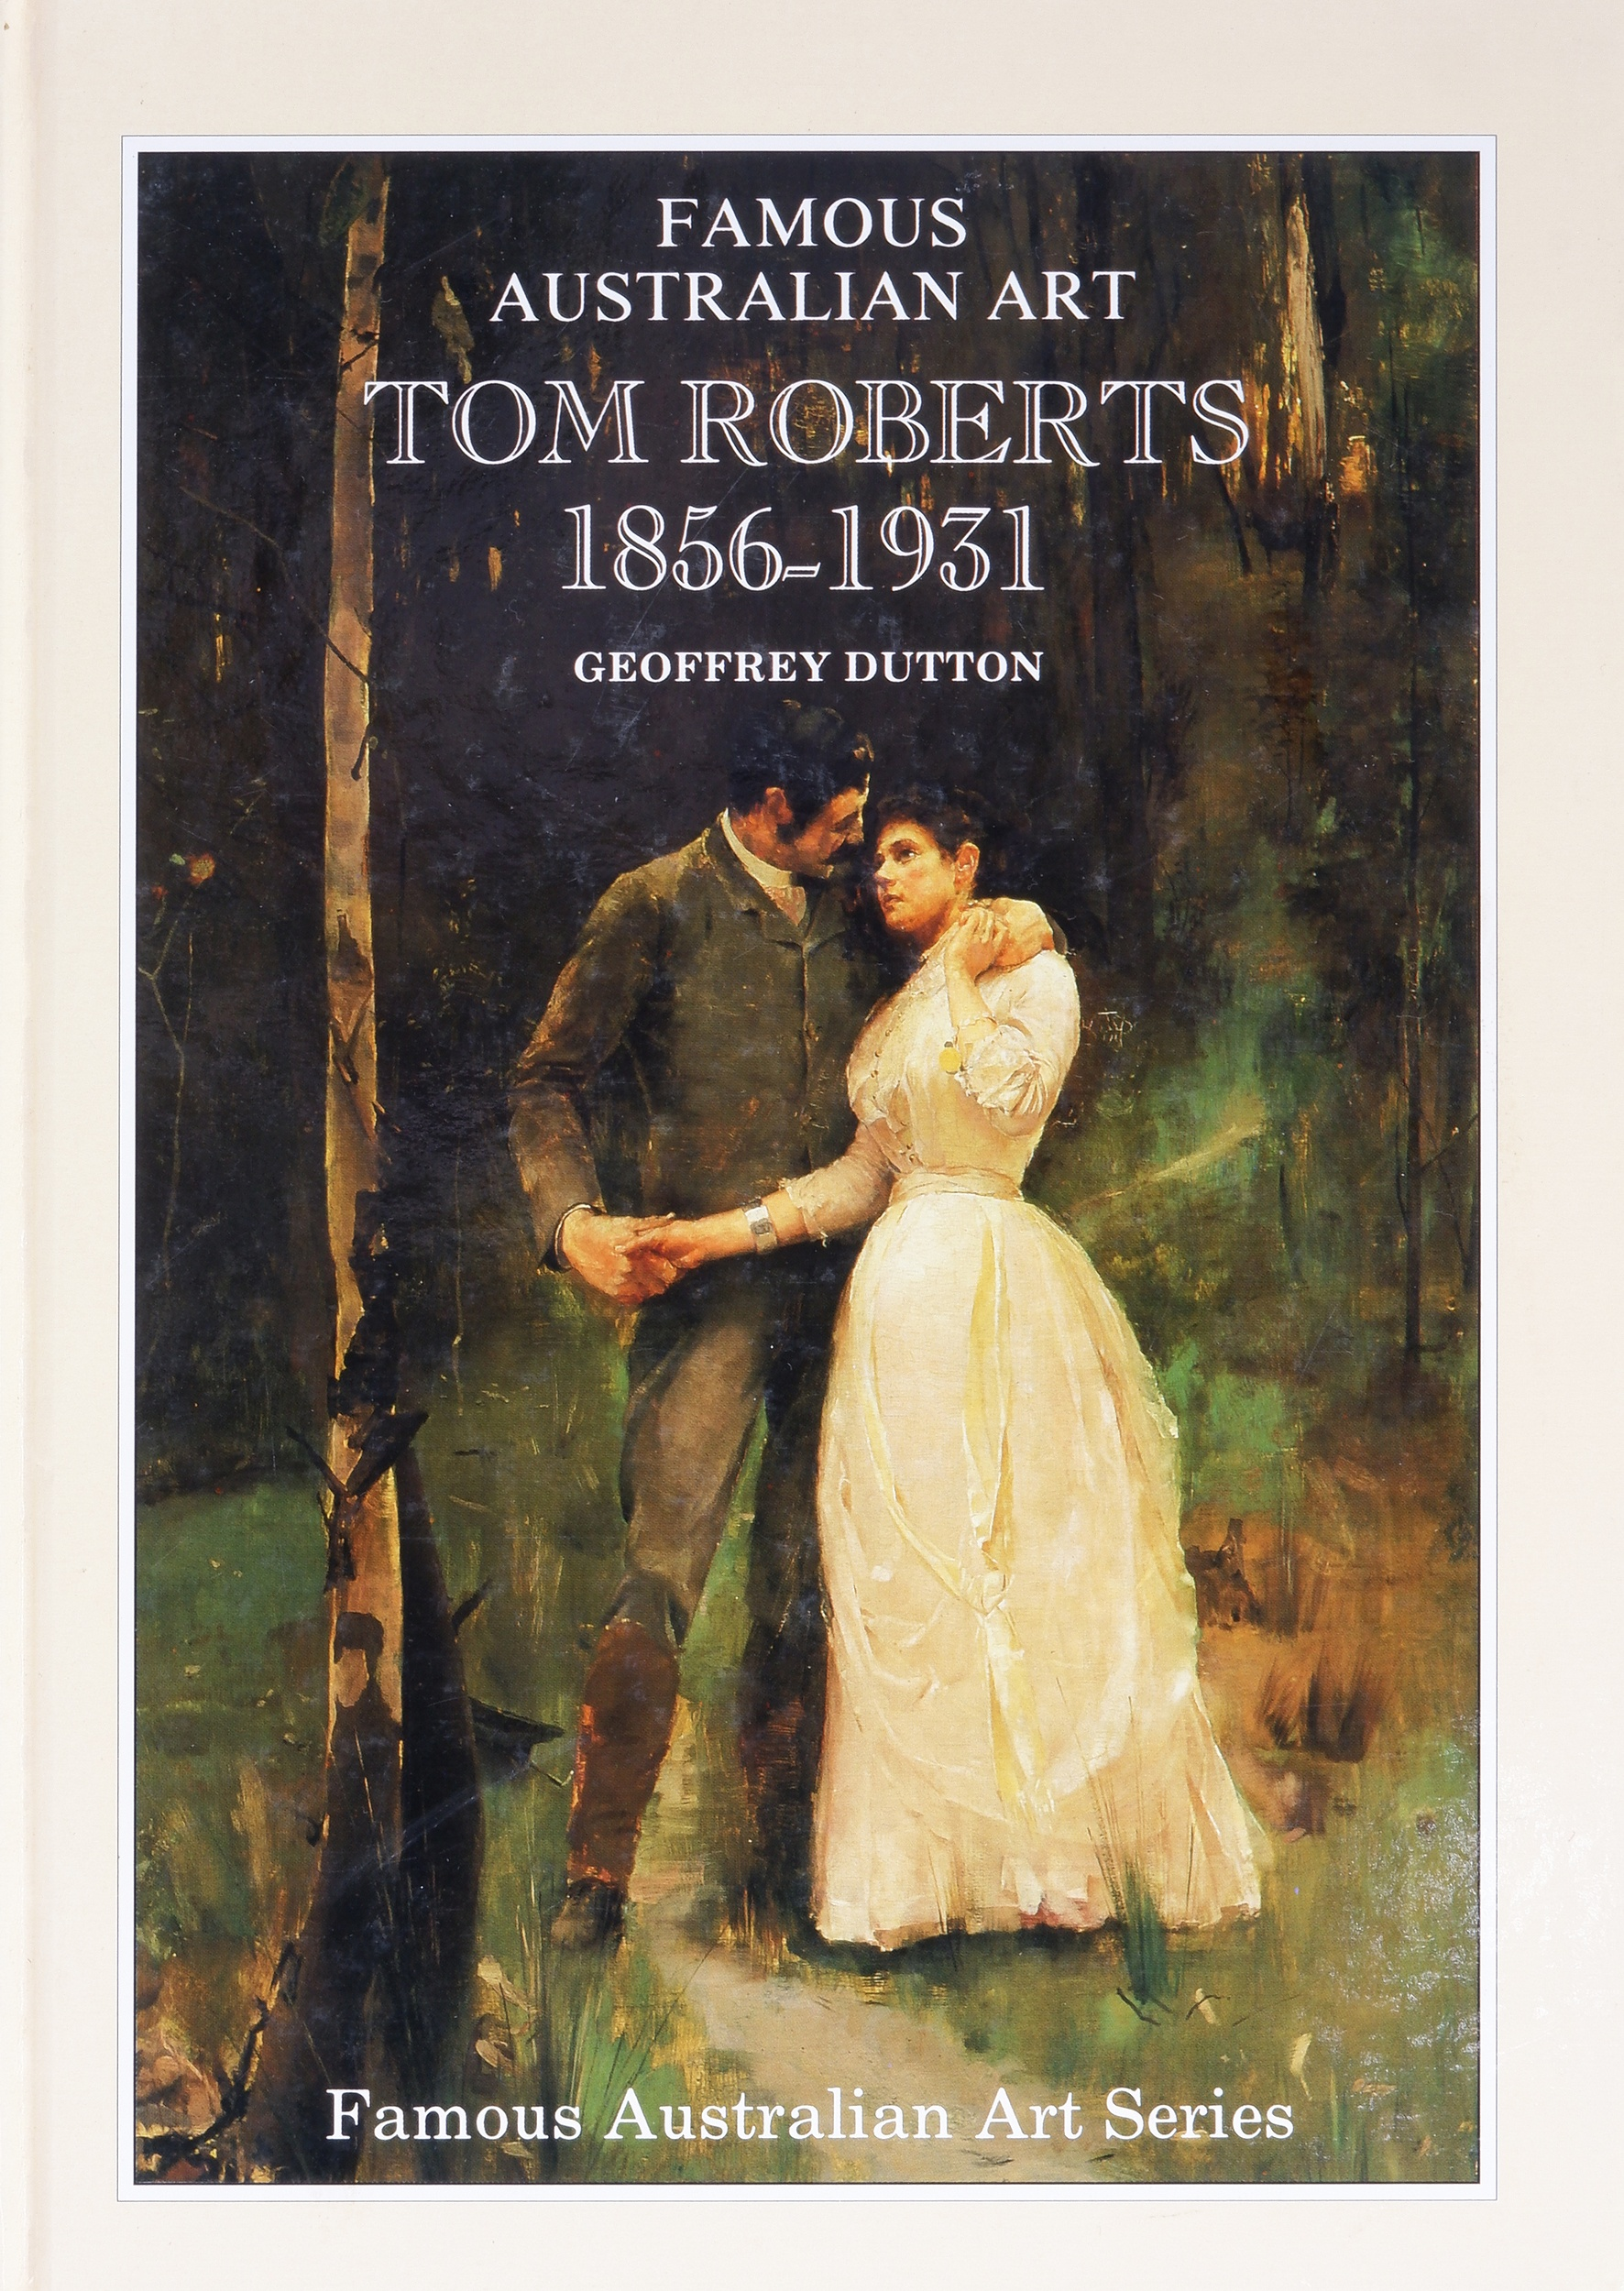 'Dutton, G., Famous Australian Art, Tom Roberts 1856-1931, Oz Publishing Co., Brisbane, 1987. Hardcover. 56 pages including 21 colour illustrations'